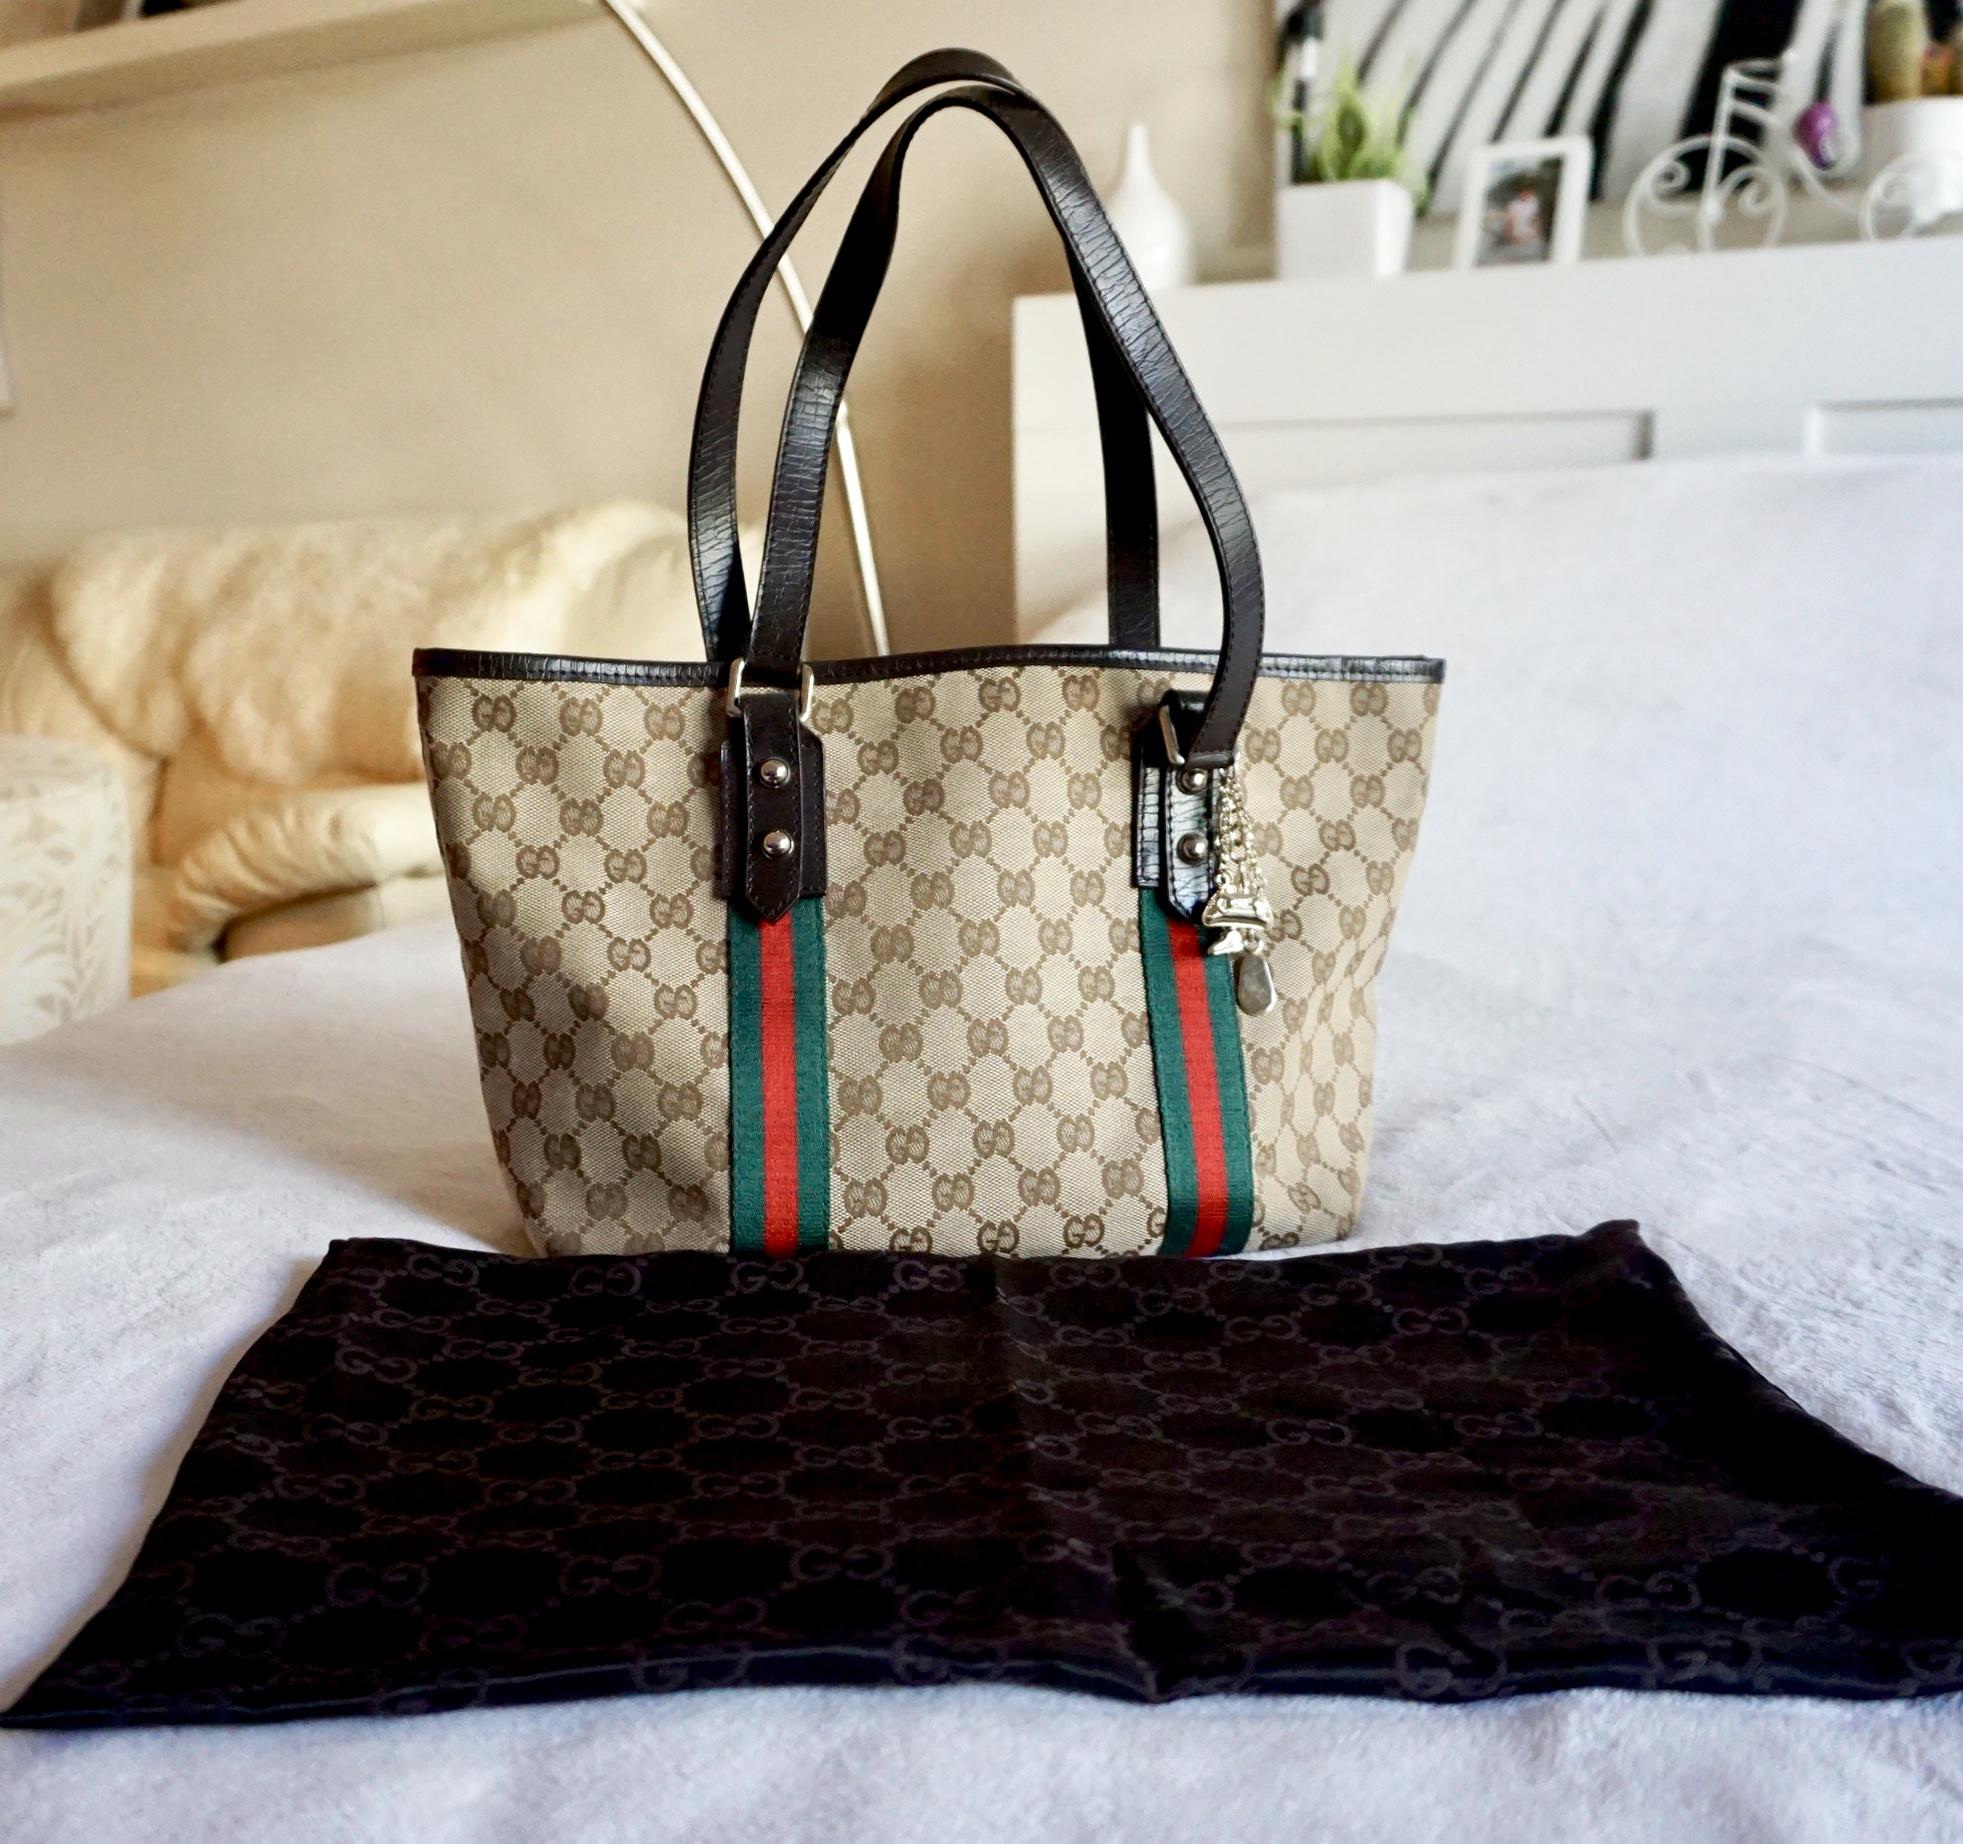 f7106936976 Gucci GG Canvas Charm Tote Bag - Luxurylana Boutique